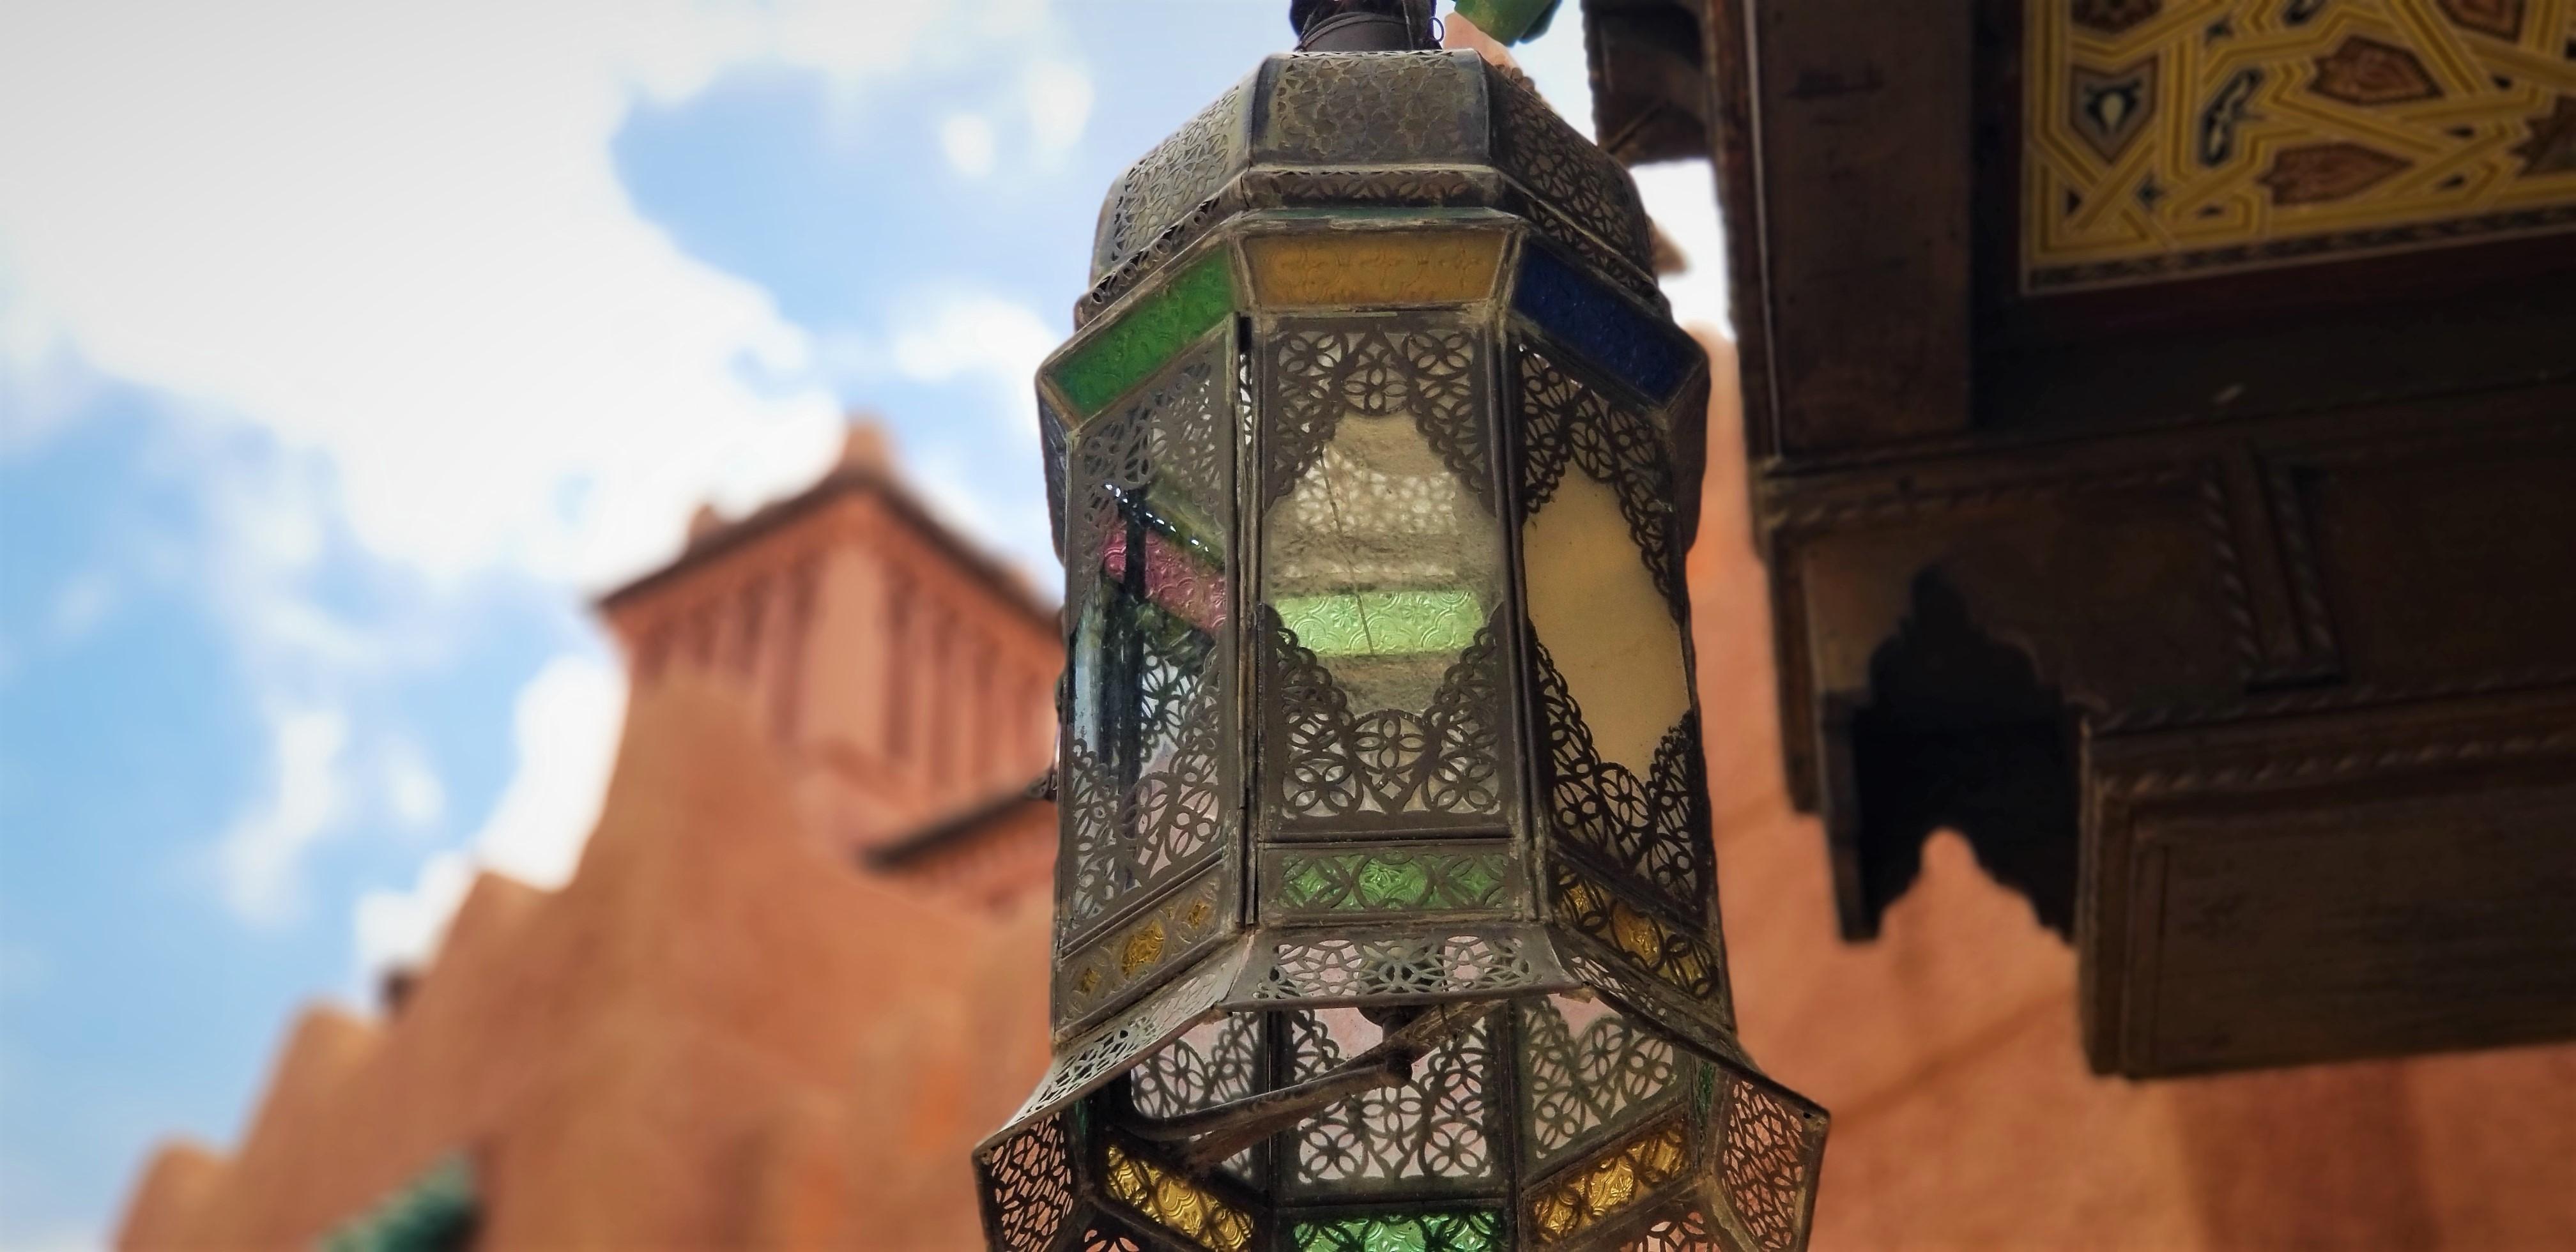 Colored lantern at Morocco pavilion